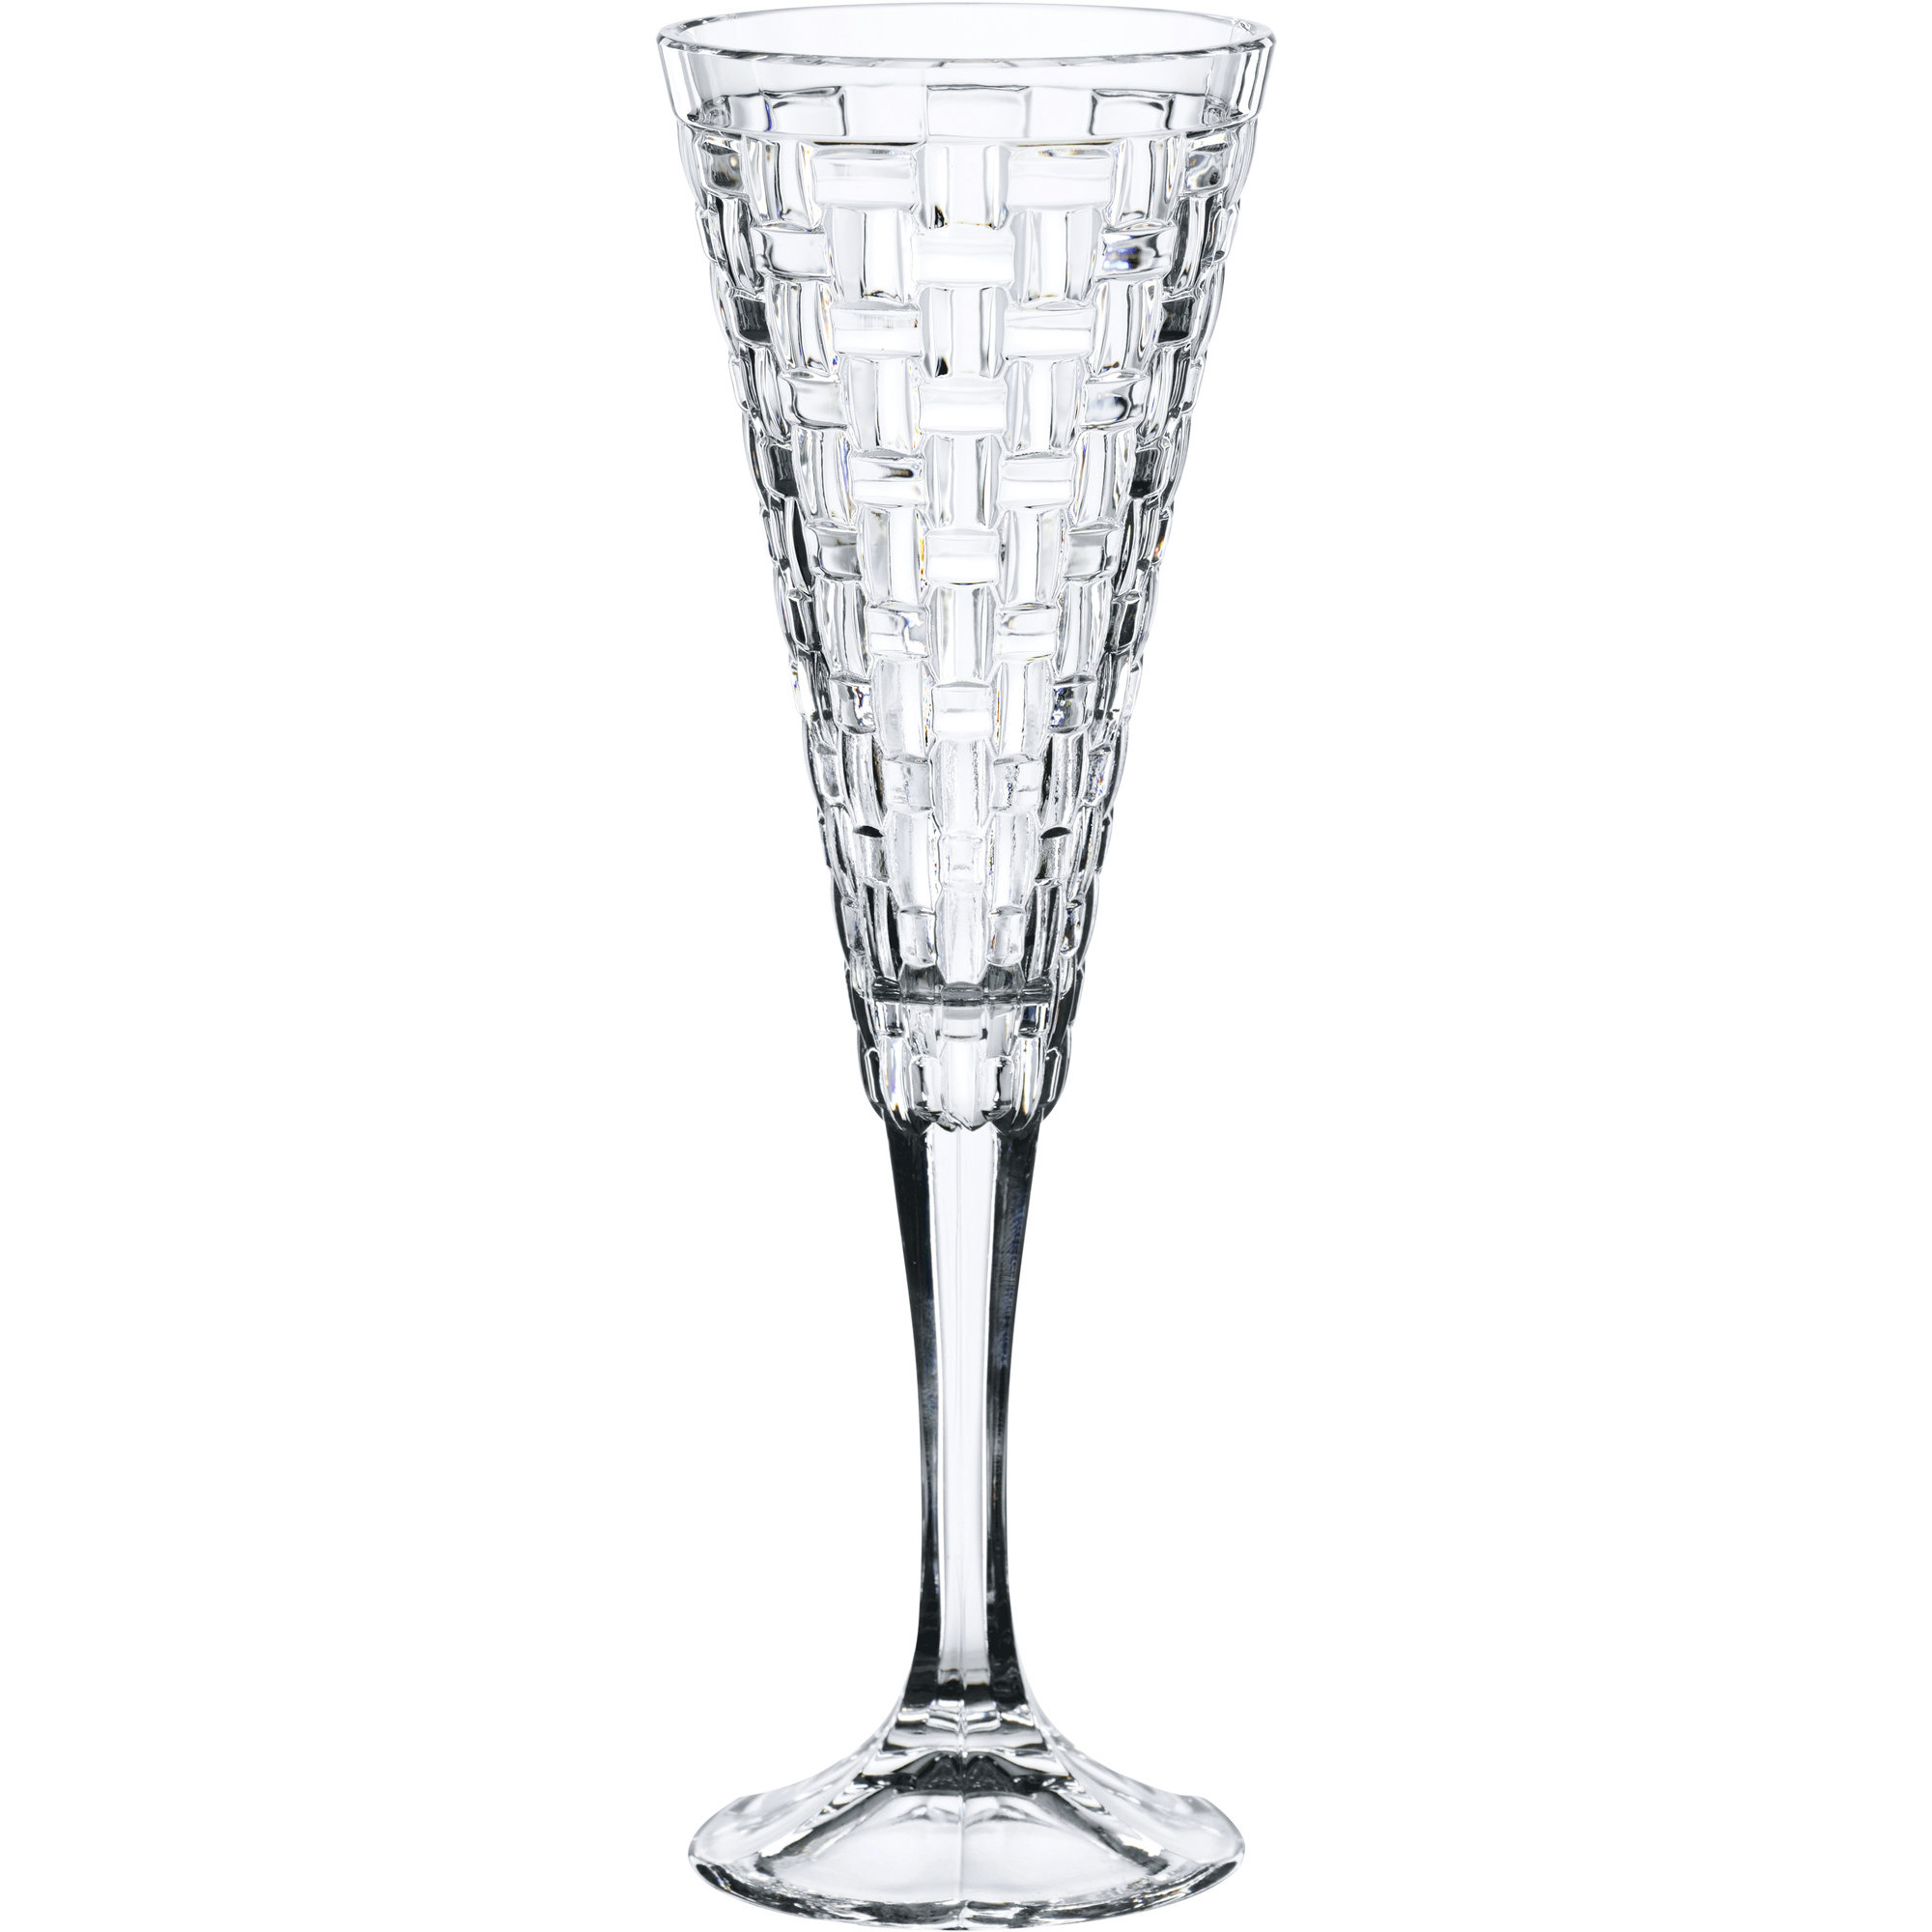 Nachtmann Bossa Nova Champagneglas 20cl 2-p